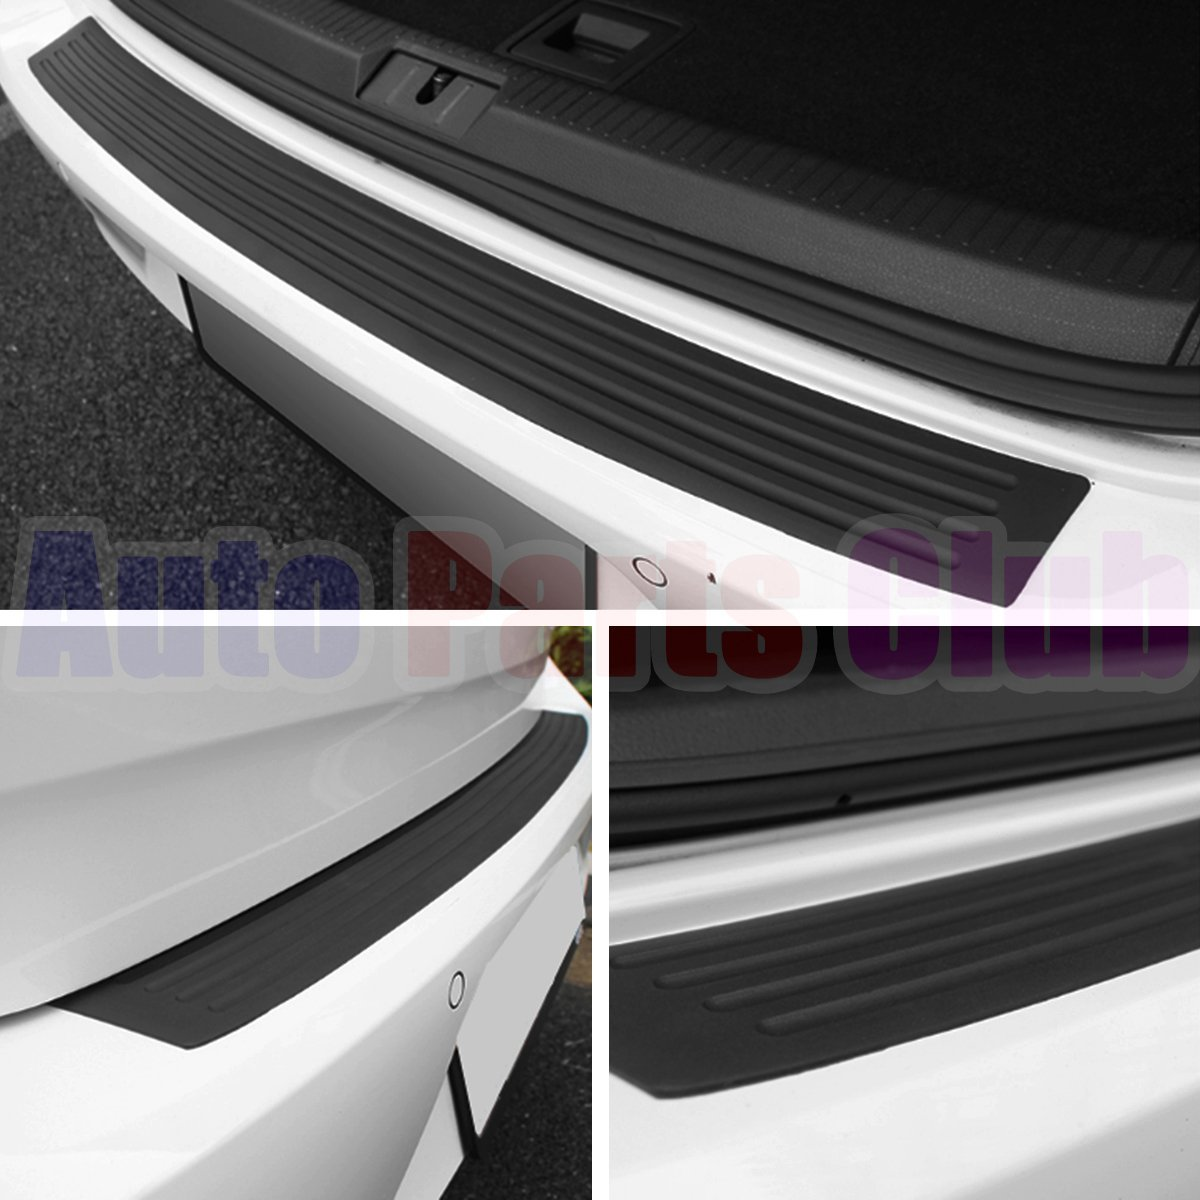 35.8 inch Rear Bumper Guard//Universal Black Rubber Door Sill Guard for Car Pickup SUV Truck//Scratch-Resistant Boot Sill Protector,Easy D.I.Y Installation Auto Parts Club u800Rear Bumper Protector